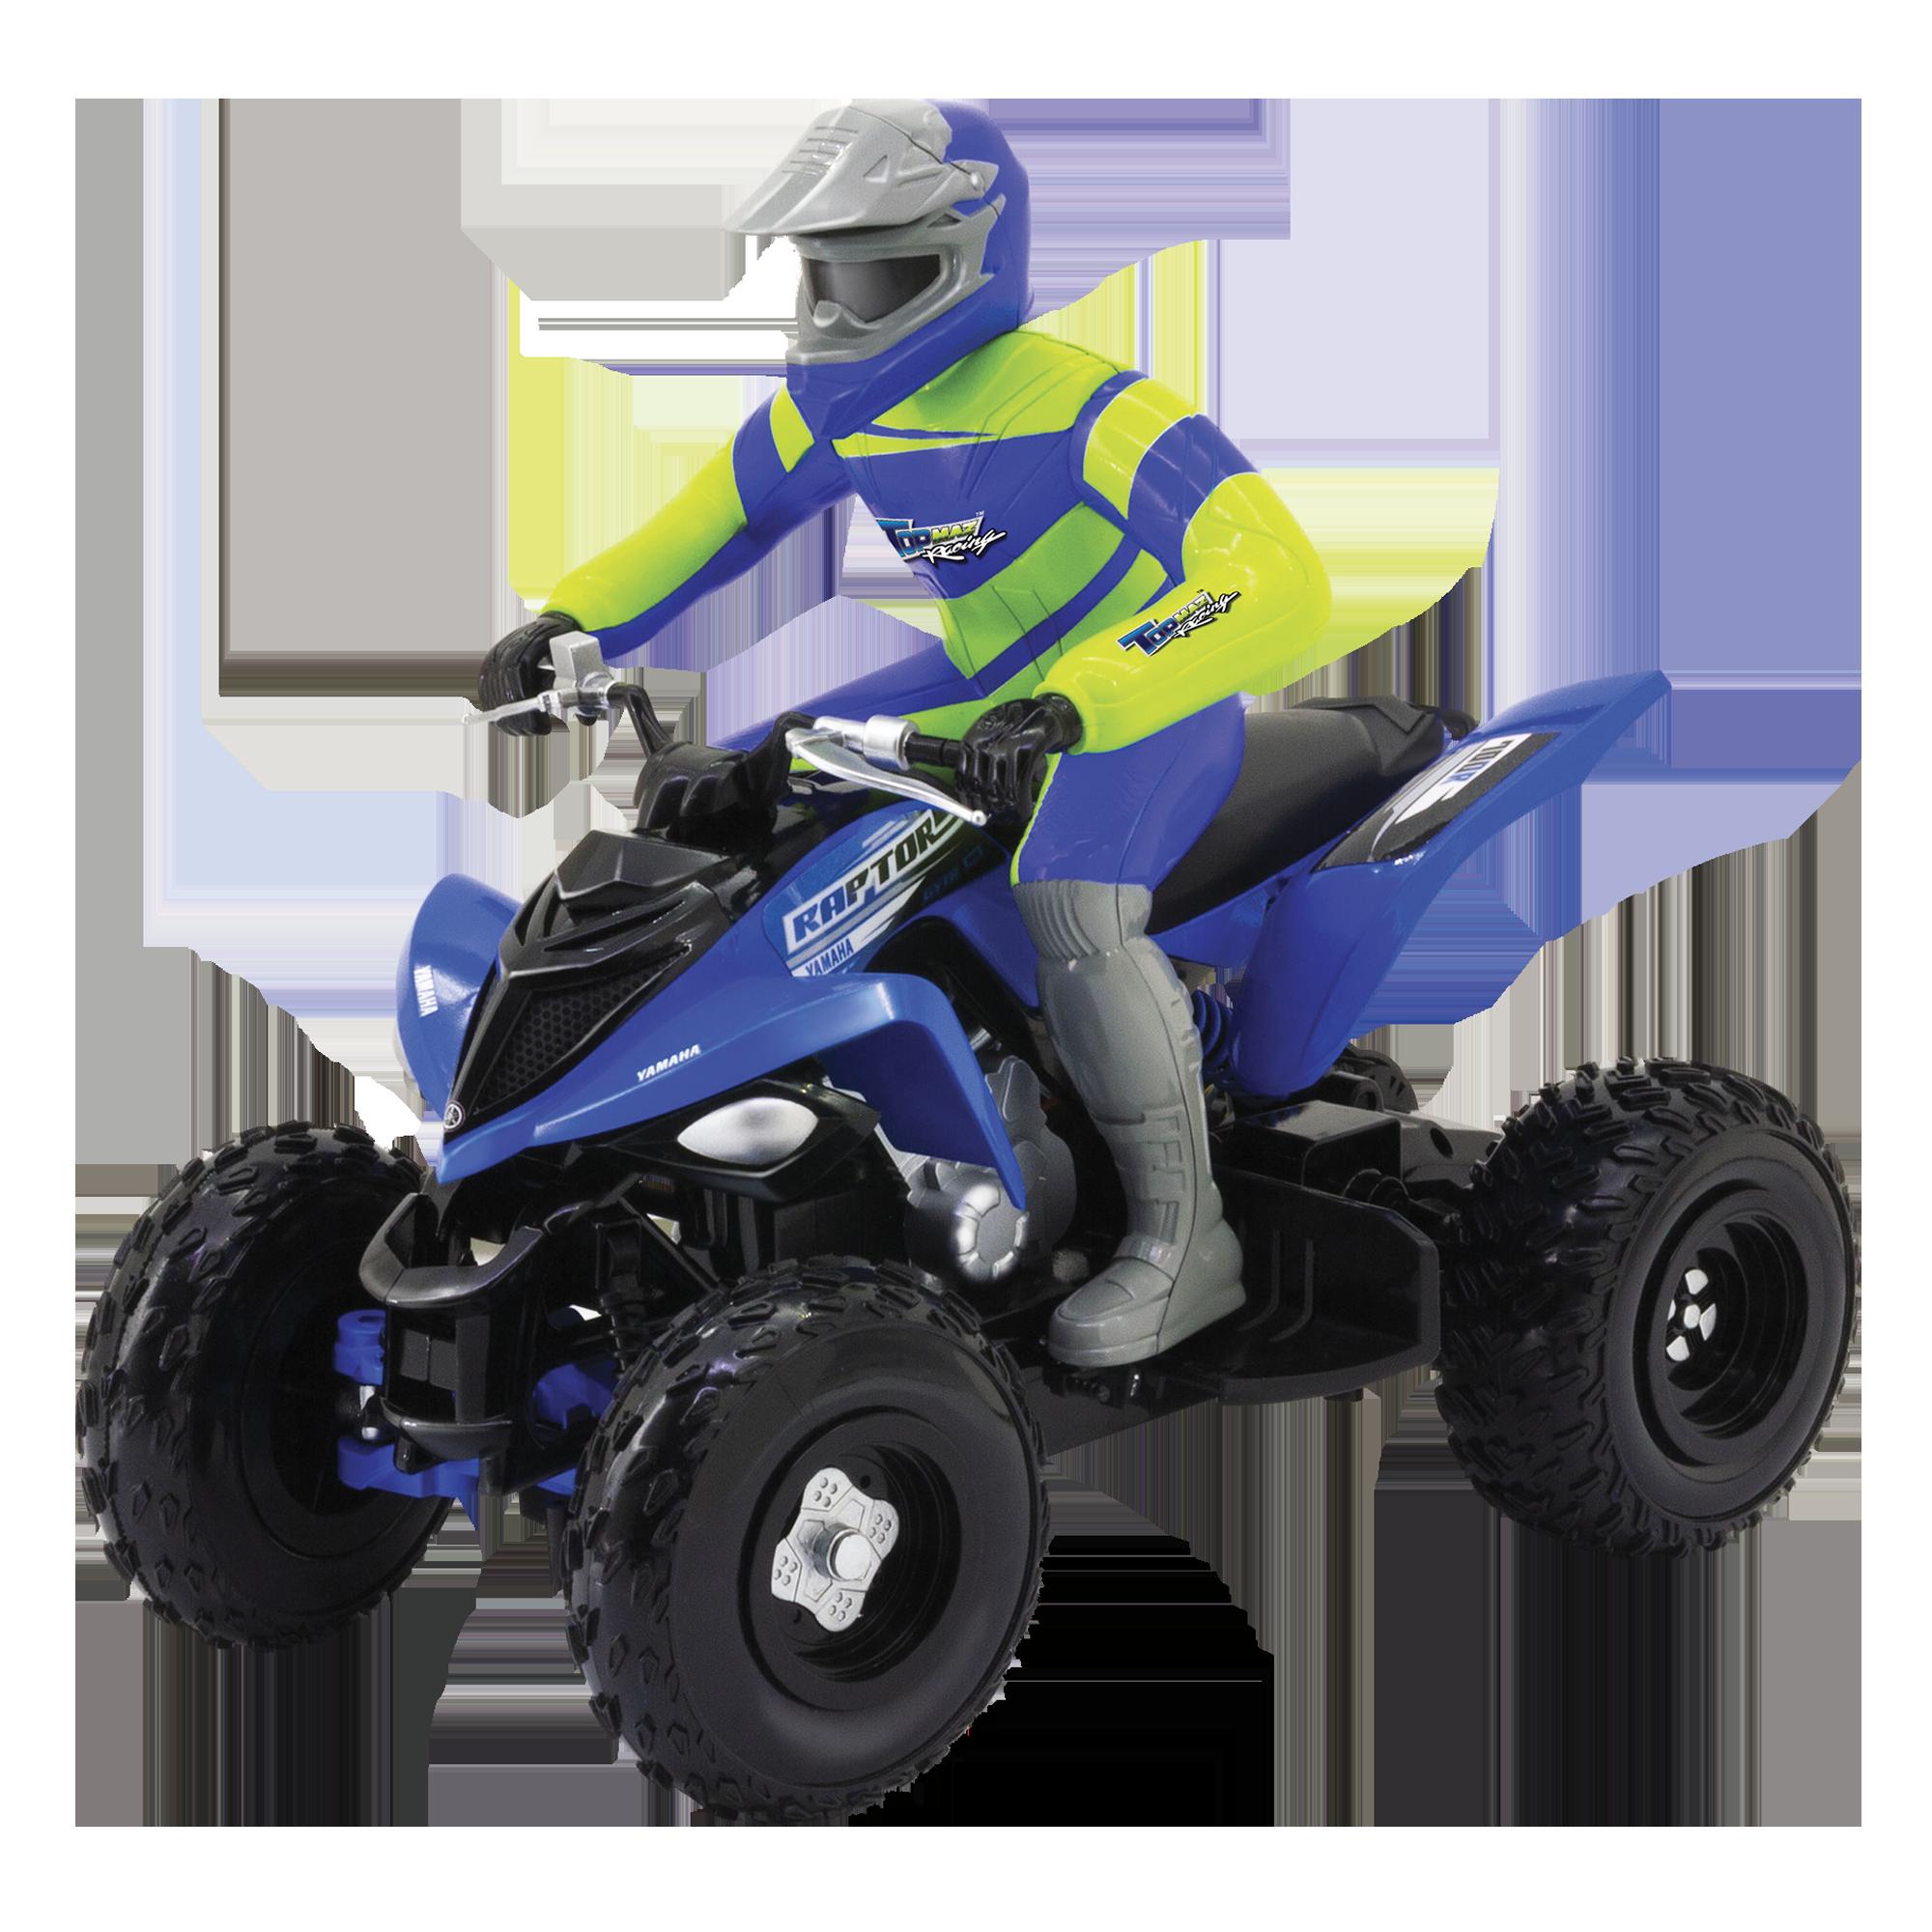 Quad r/c raptor - MOTOR&CO R/C